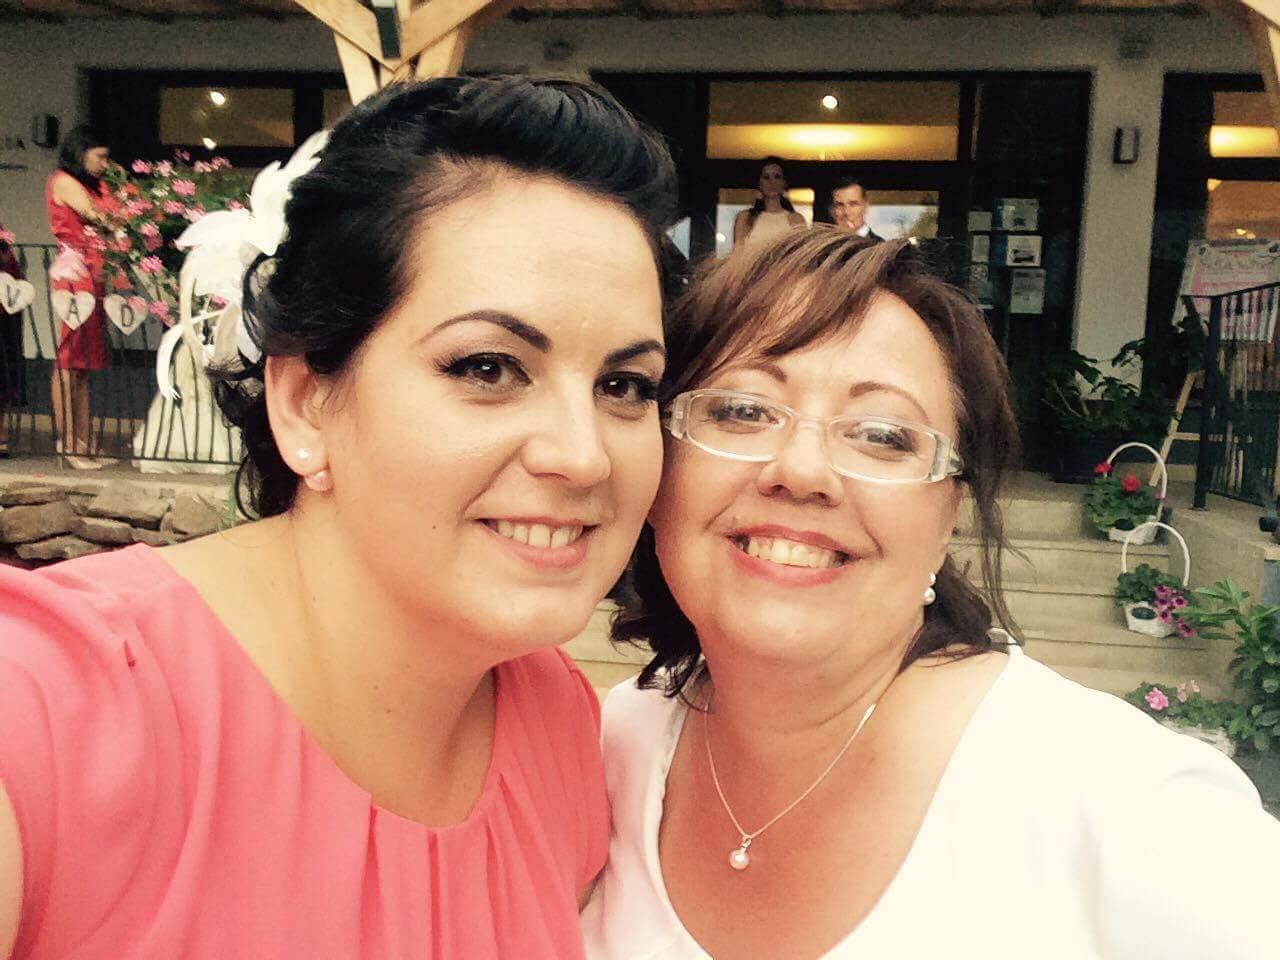 ♥ Vikulka{{_AND_}}Peťo ♥ - Foto mobil: Moja sesternica s mojou maminkou ♥